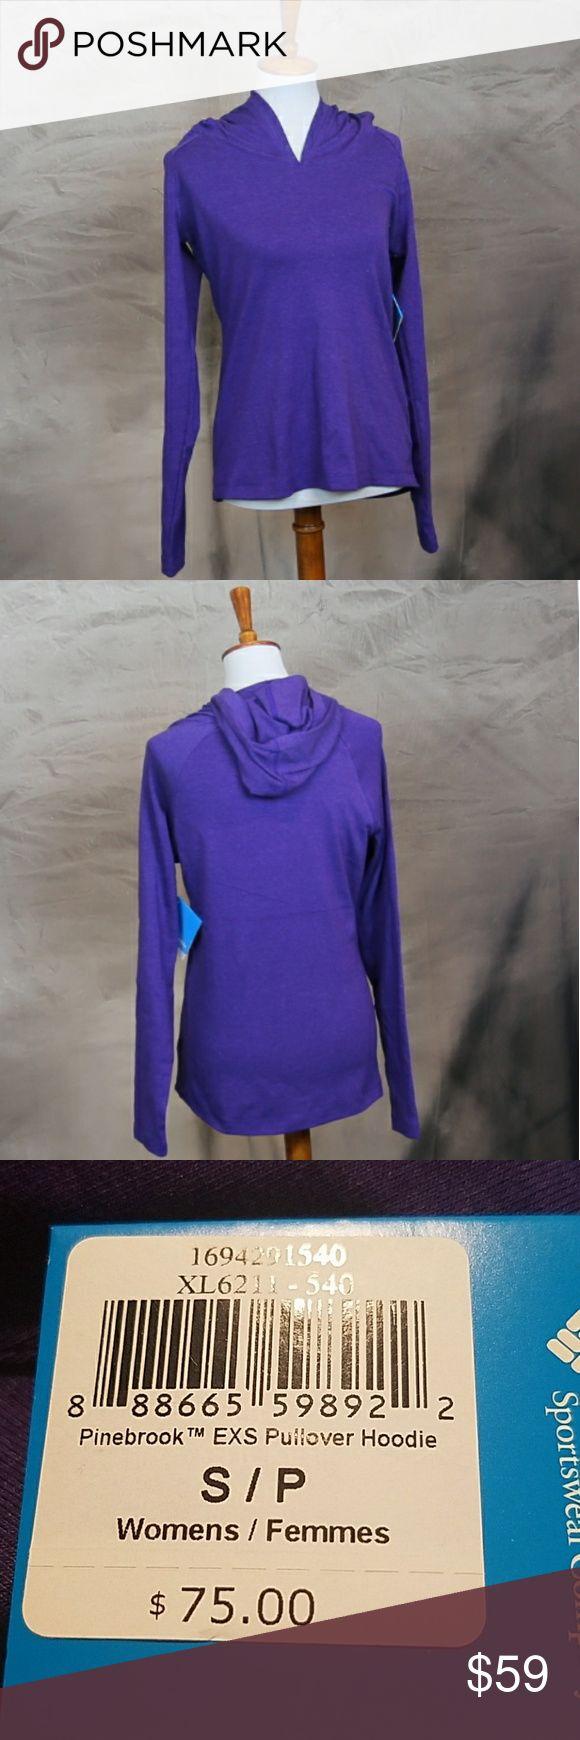 NWT Columbia Sportswear Pinebrook pullover hoodie NWT Columbia Sportswear Pinebrook pullover hoodie. Purple. S Columbia Tops Sweatshirts & Hoodies